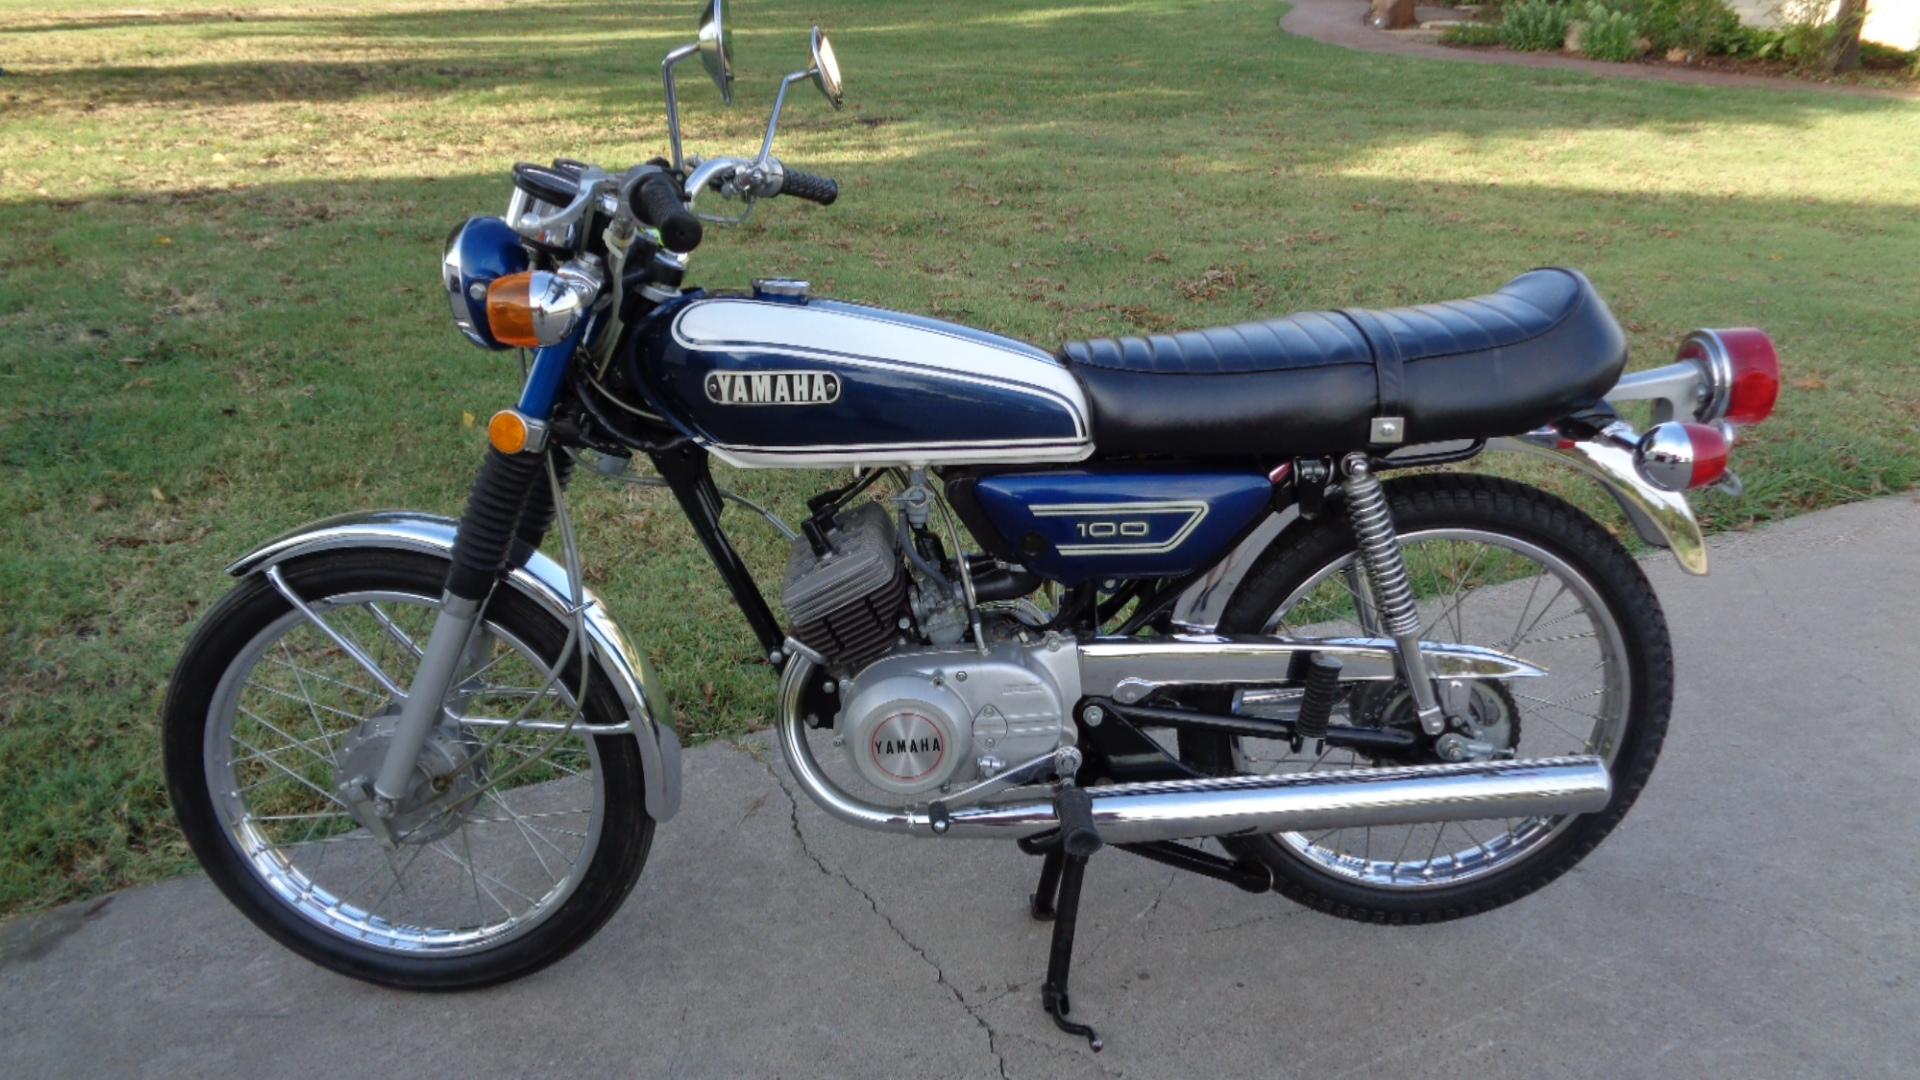 Yamaha Ls